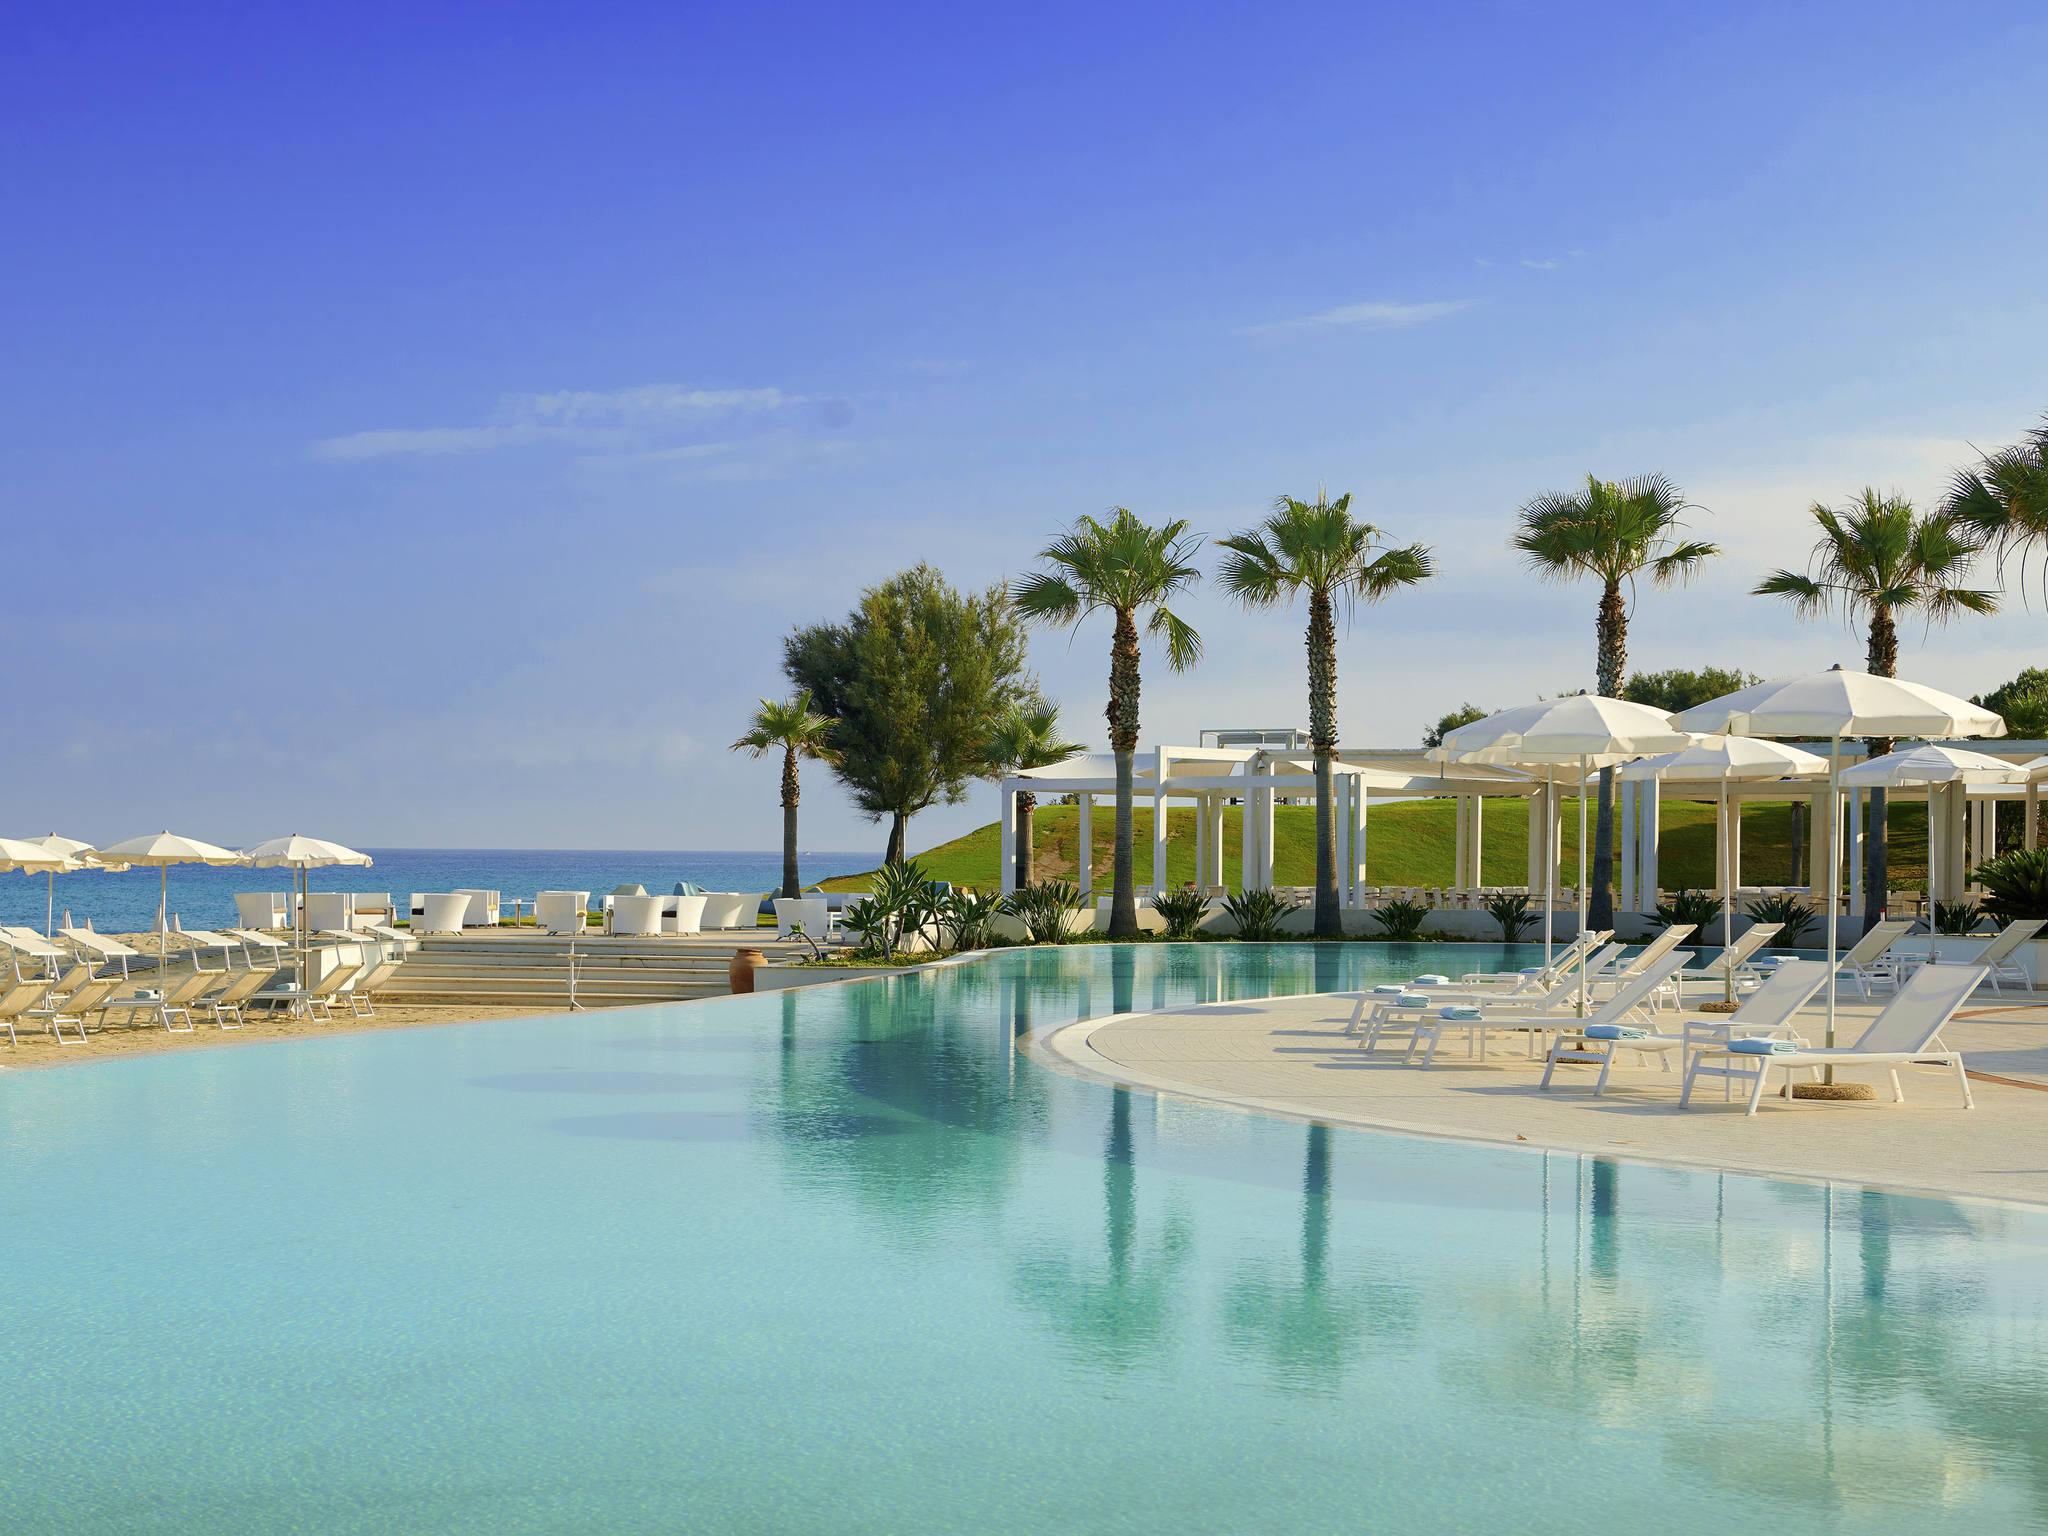 Hotel – Capovaticano Resort Thalasso & Spa - MGallery by Sofitel